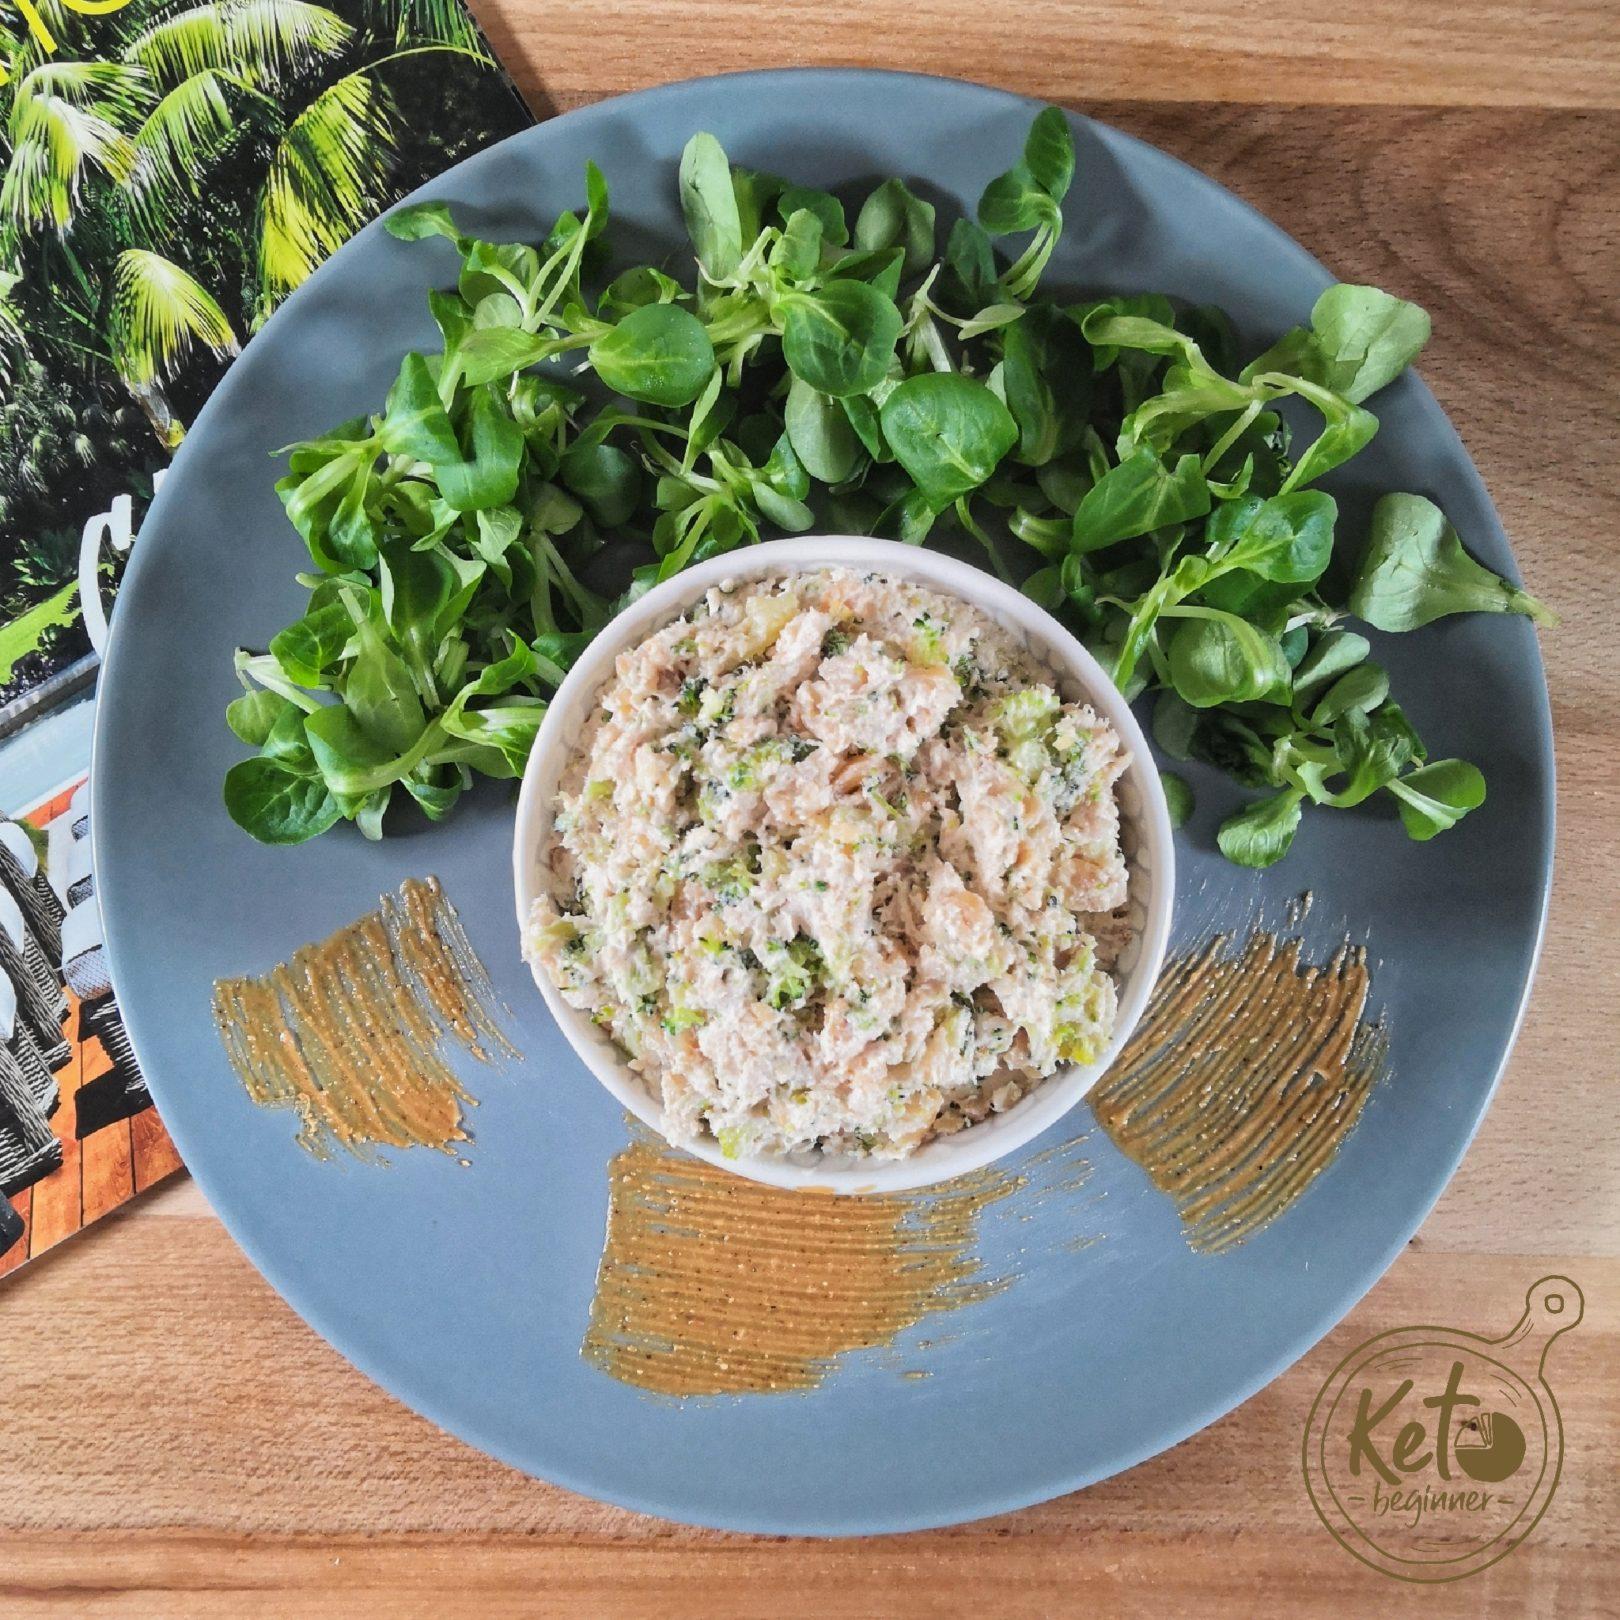 Nuts Chicken & Broccoli Salad – All Year Long